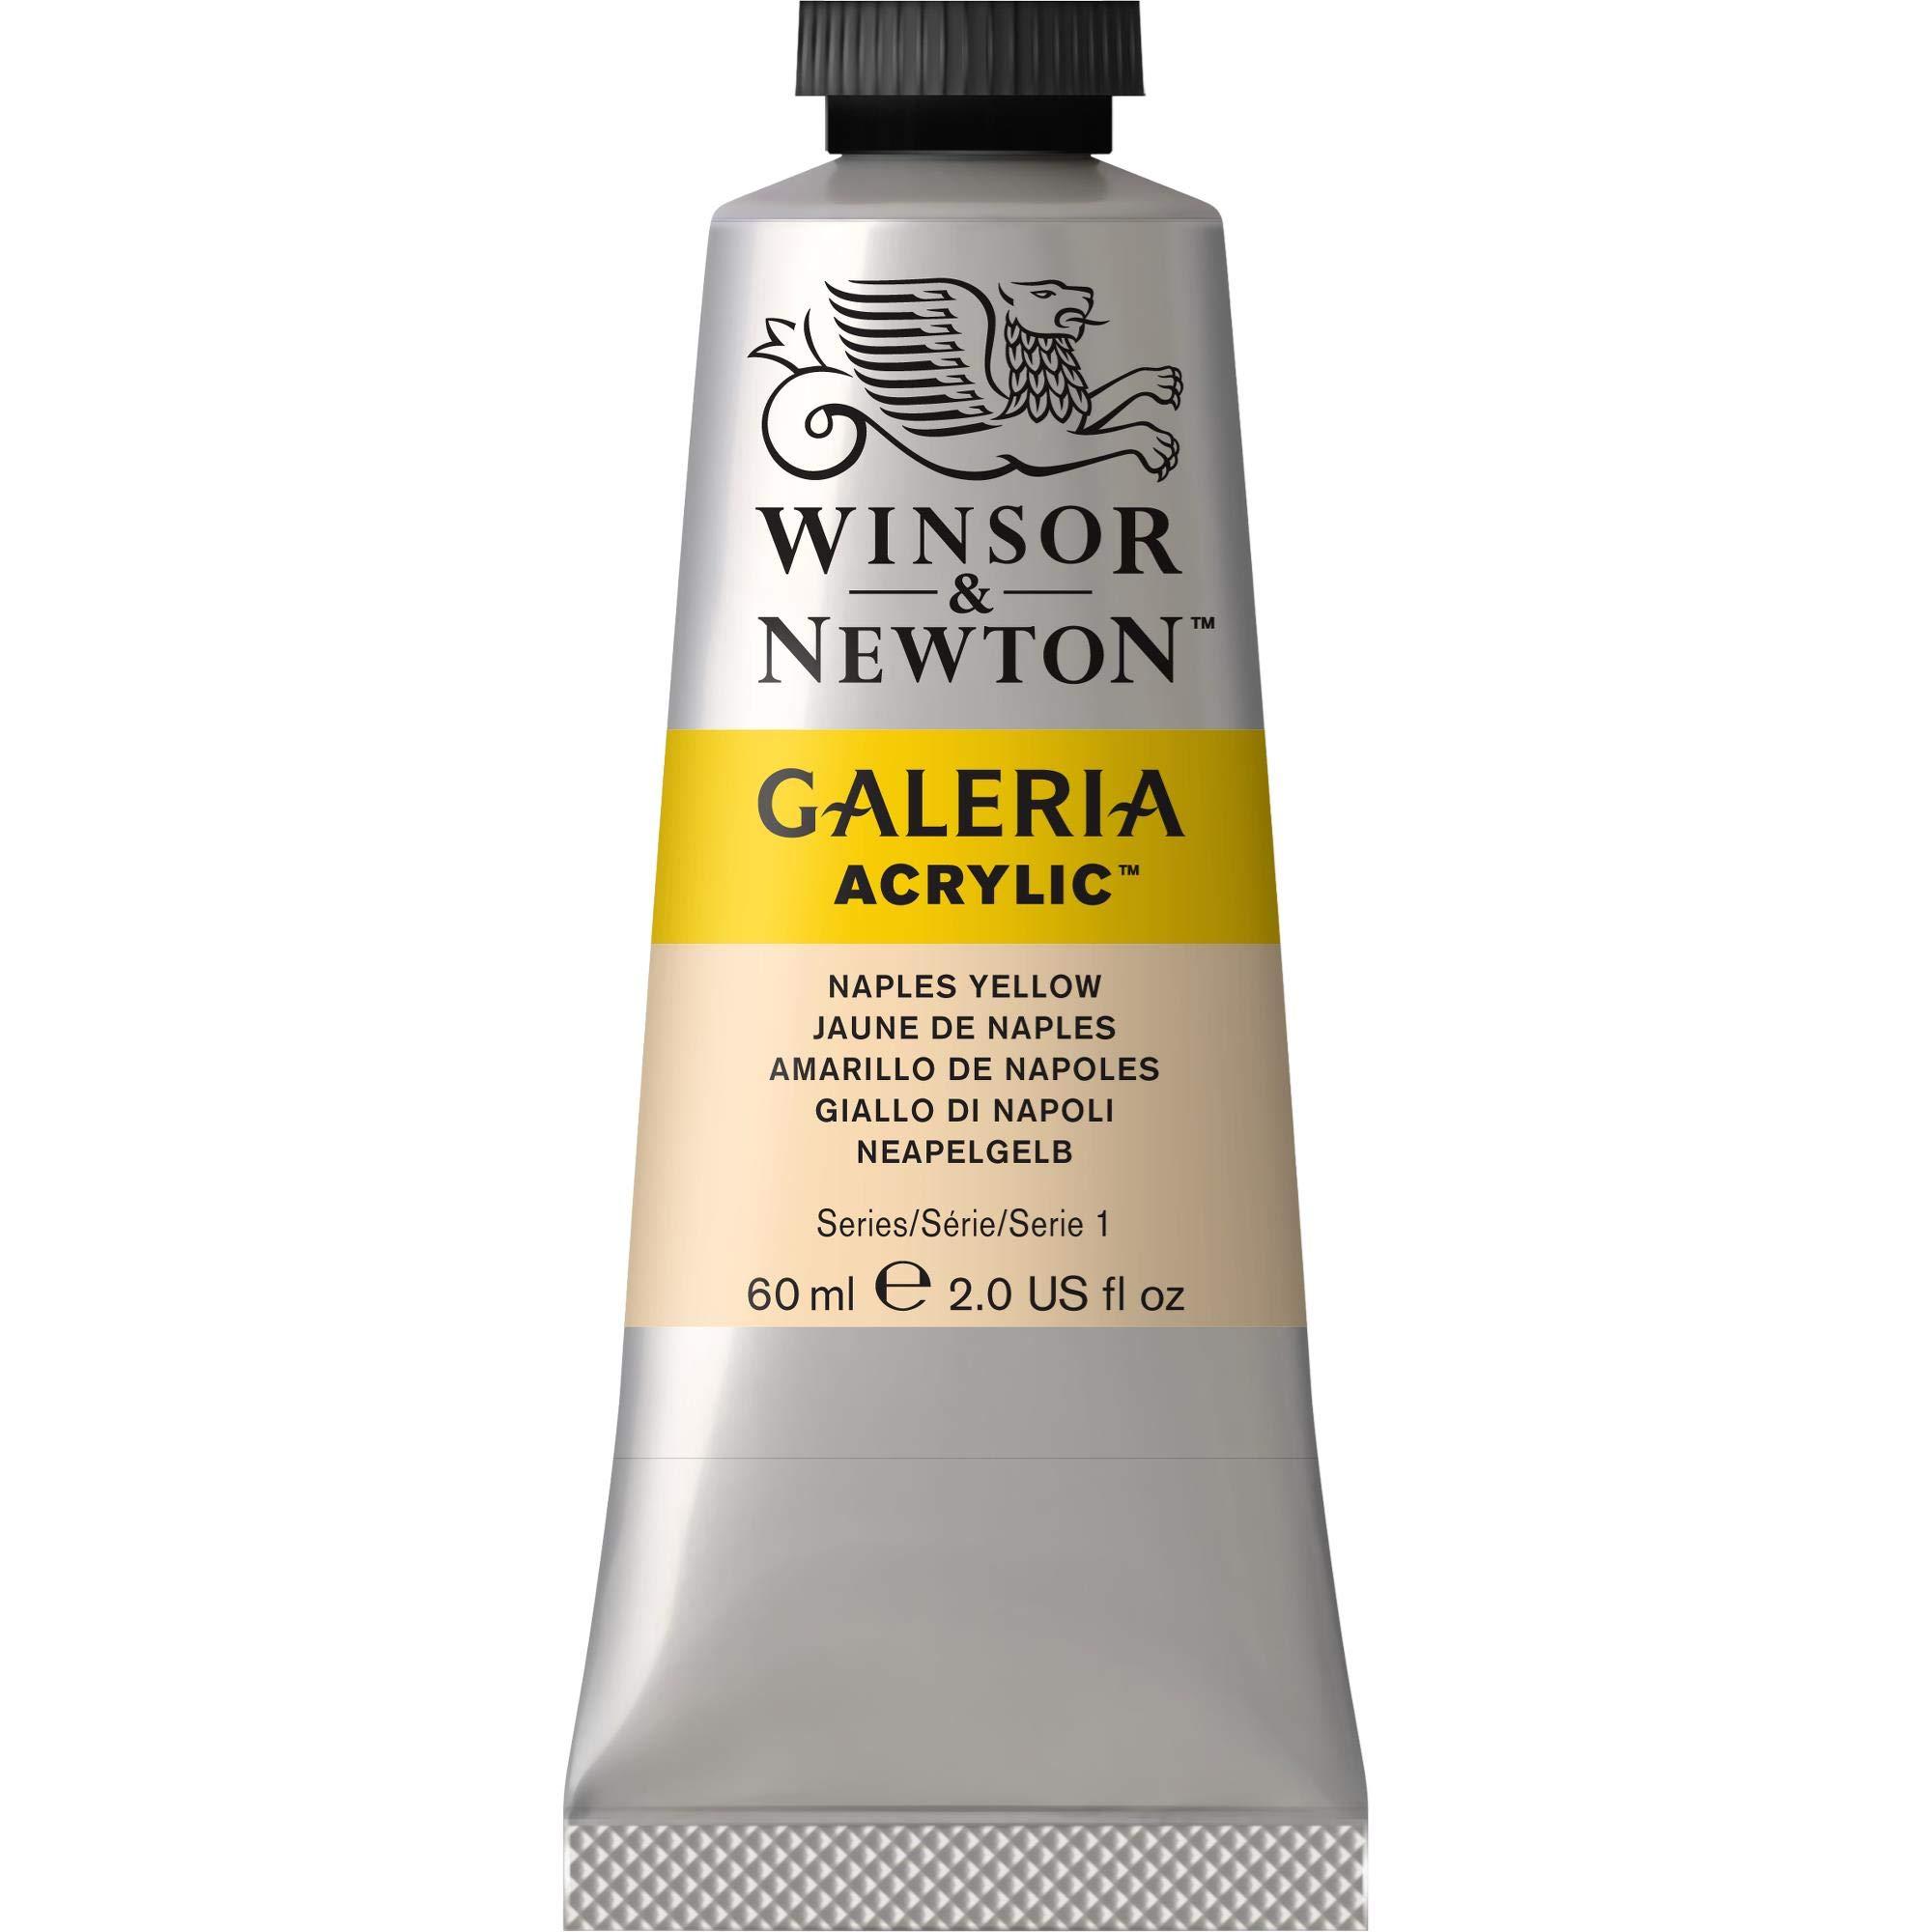 Winsor & Newton, Naples Yellow Galeria Acrylic Paint, 60ml Tube, 60-ml, 2 Fl Oz